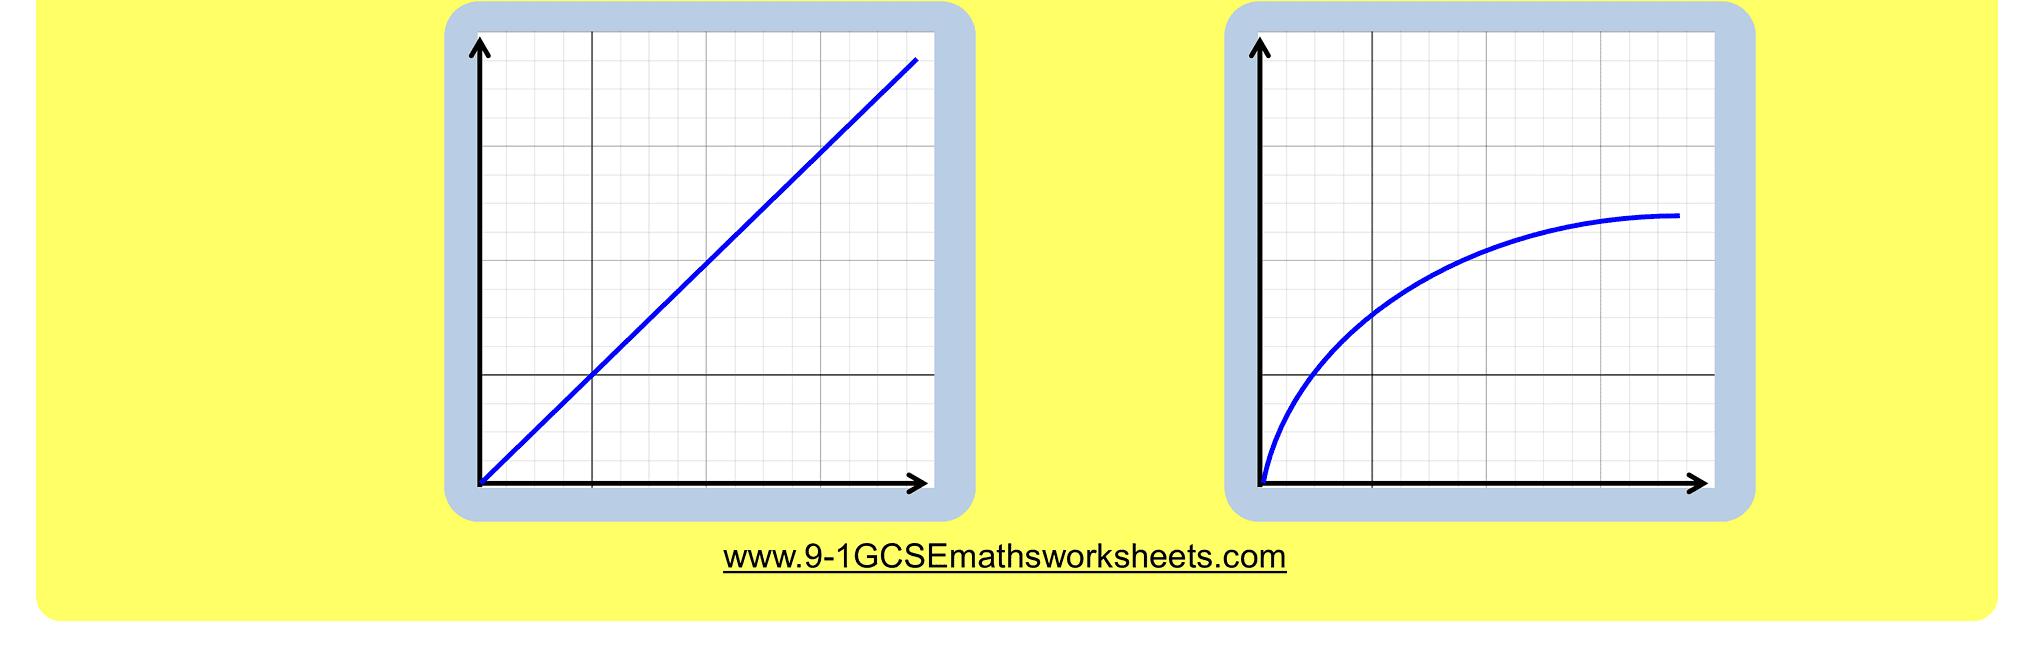 Inverse Proportion Worksheets